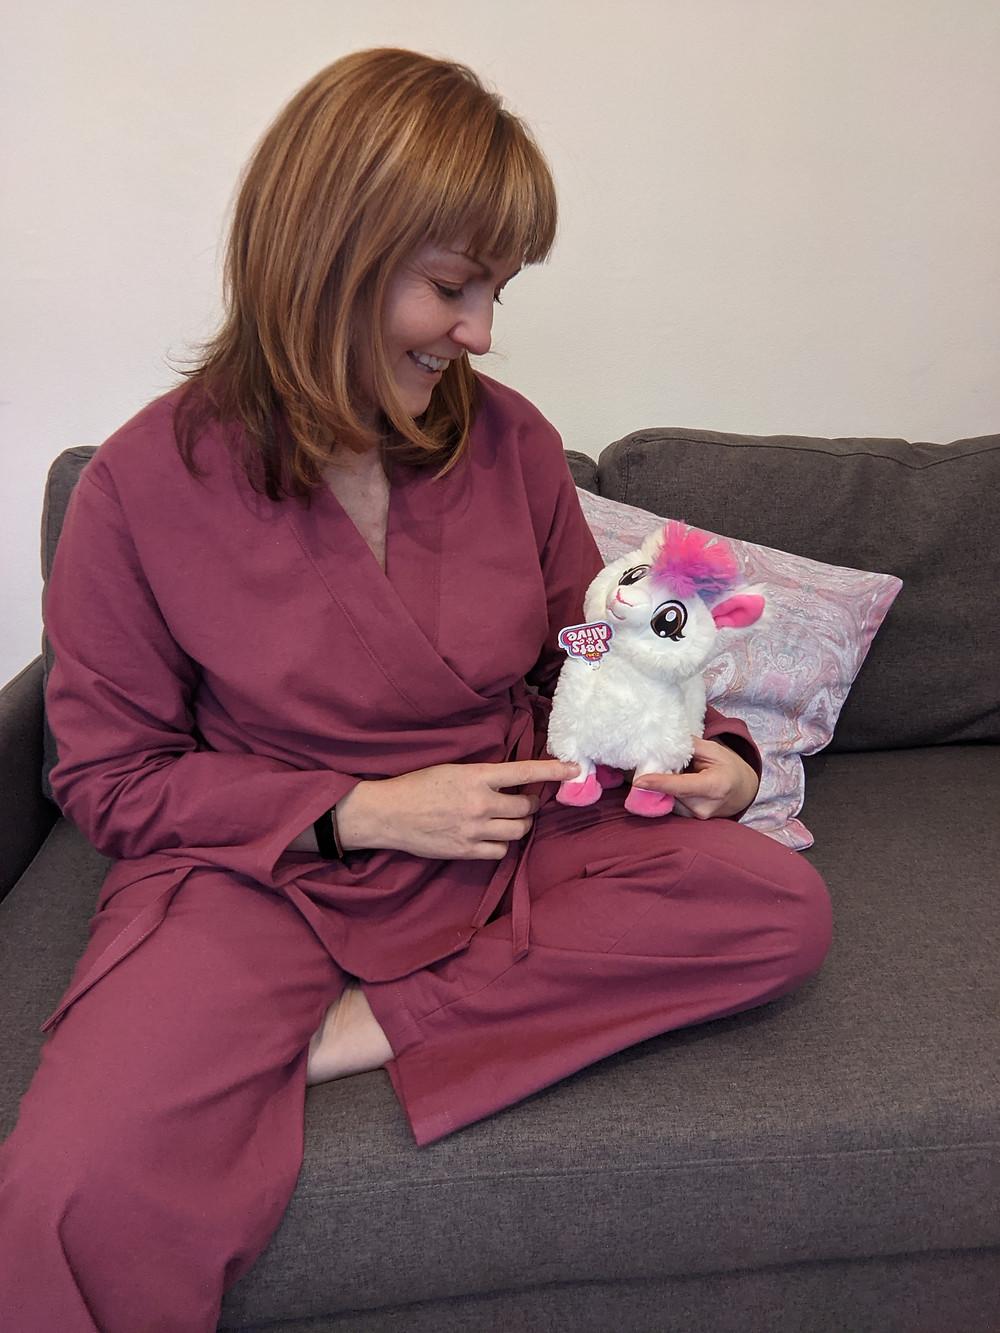 Pine Cove Pajamas appreciated by my llama